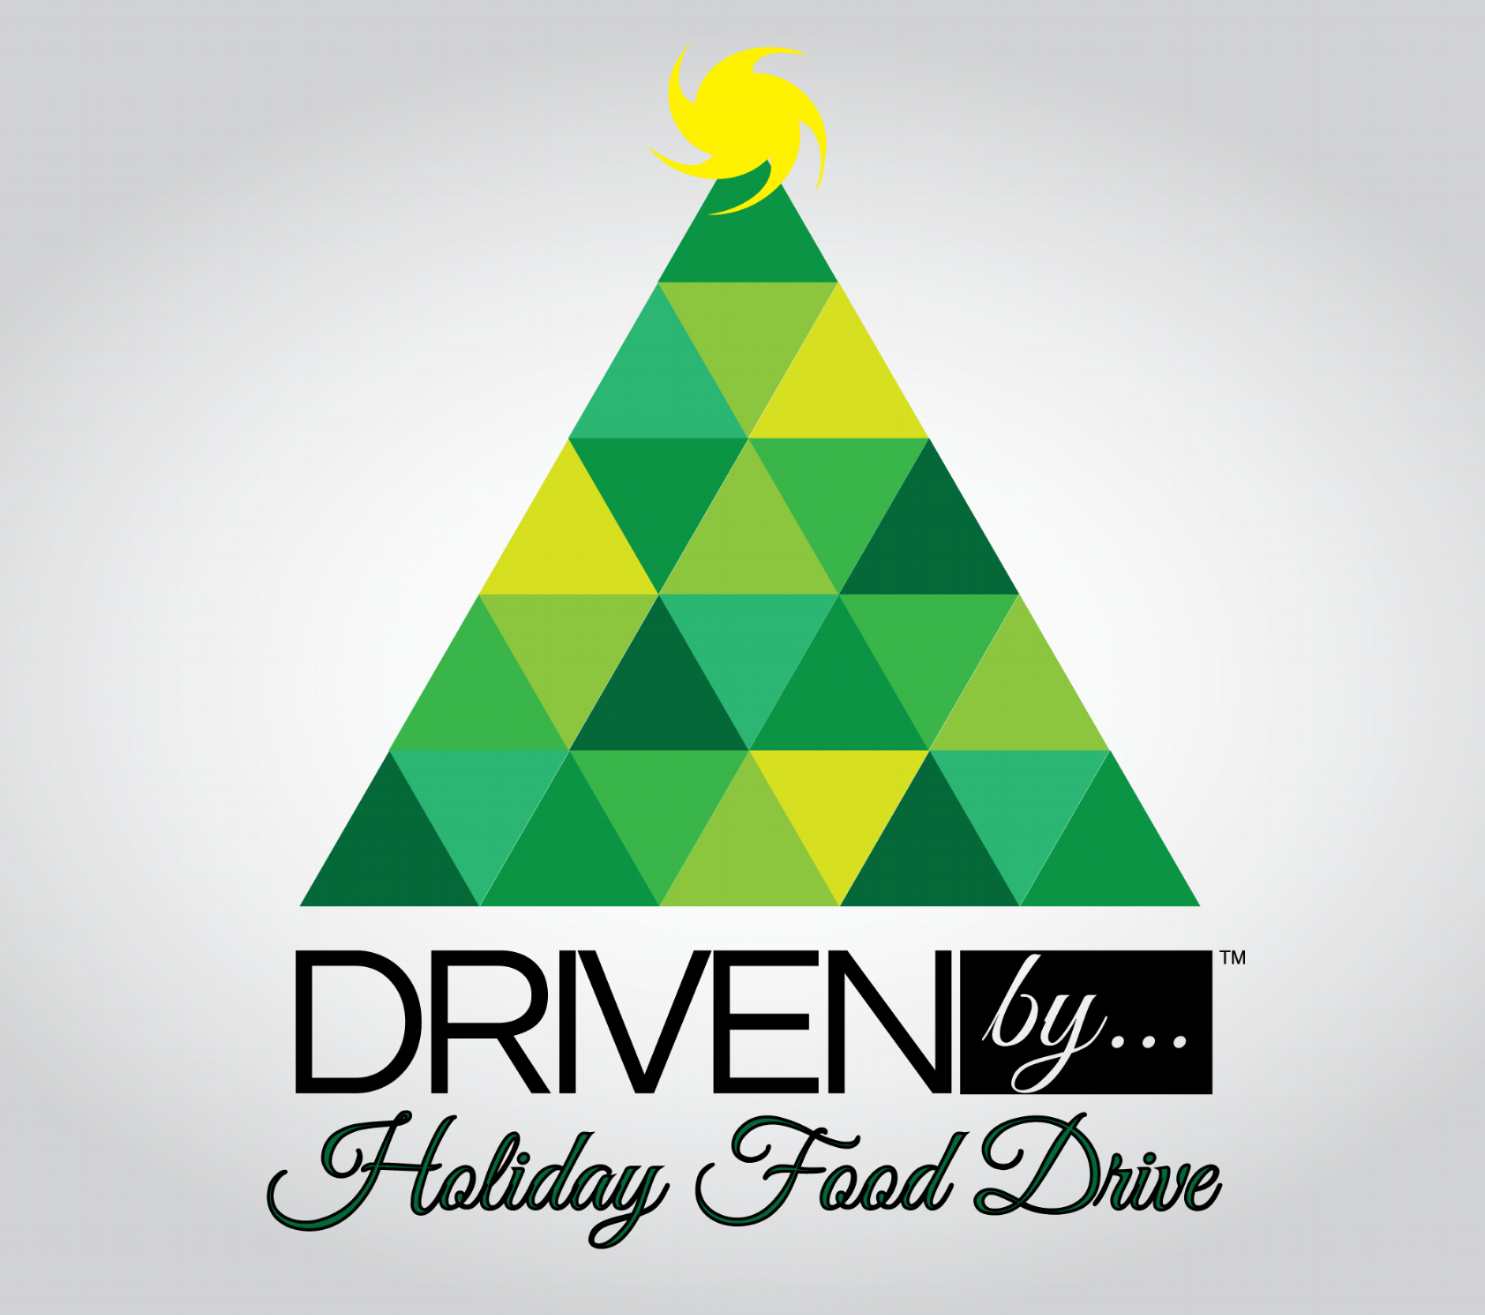 Holiday-Food-Drive-02.png